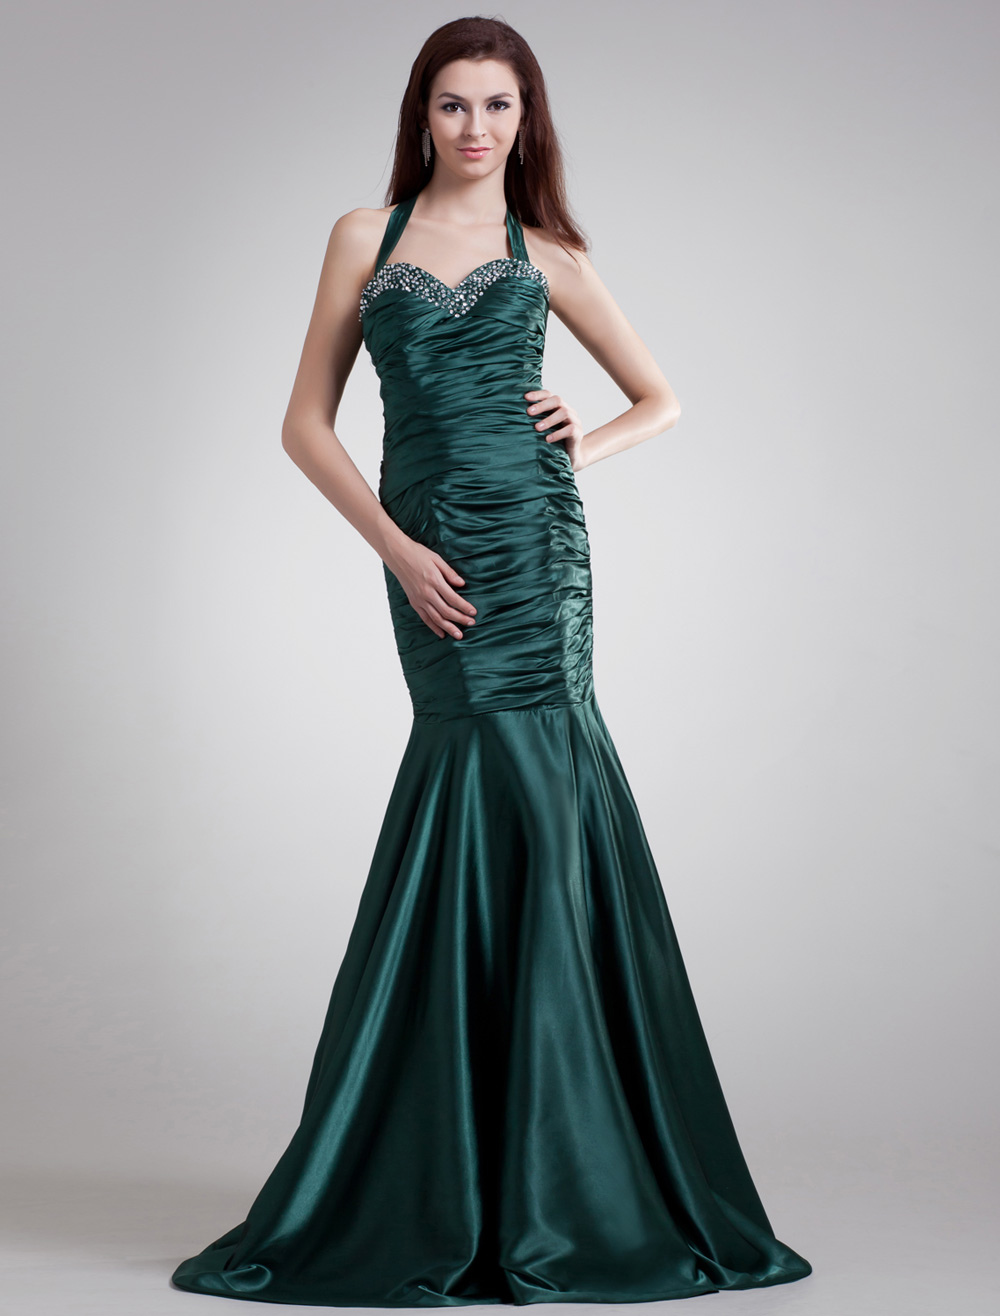 Charming Dark Green Halter Beading Ball Gown Evening Dress